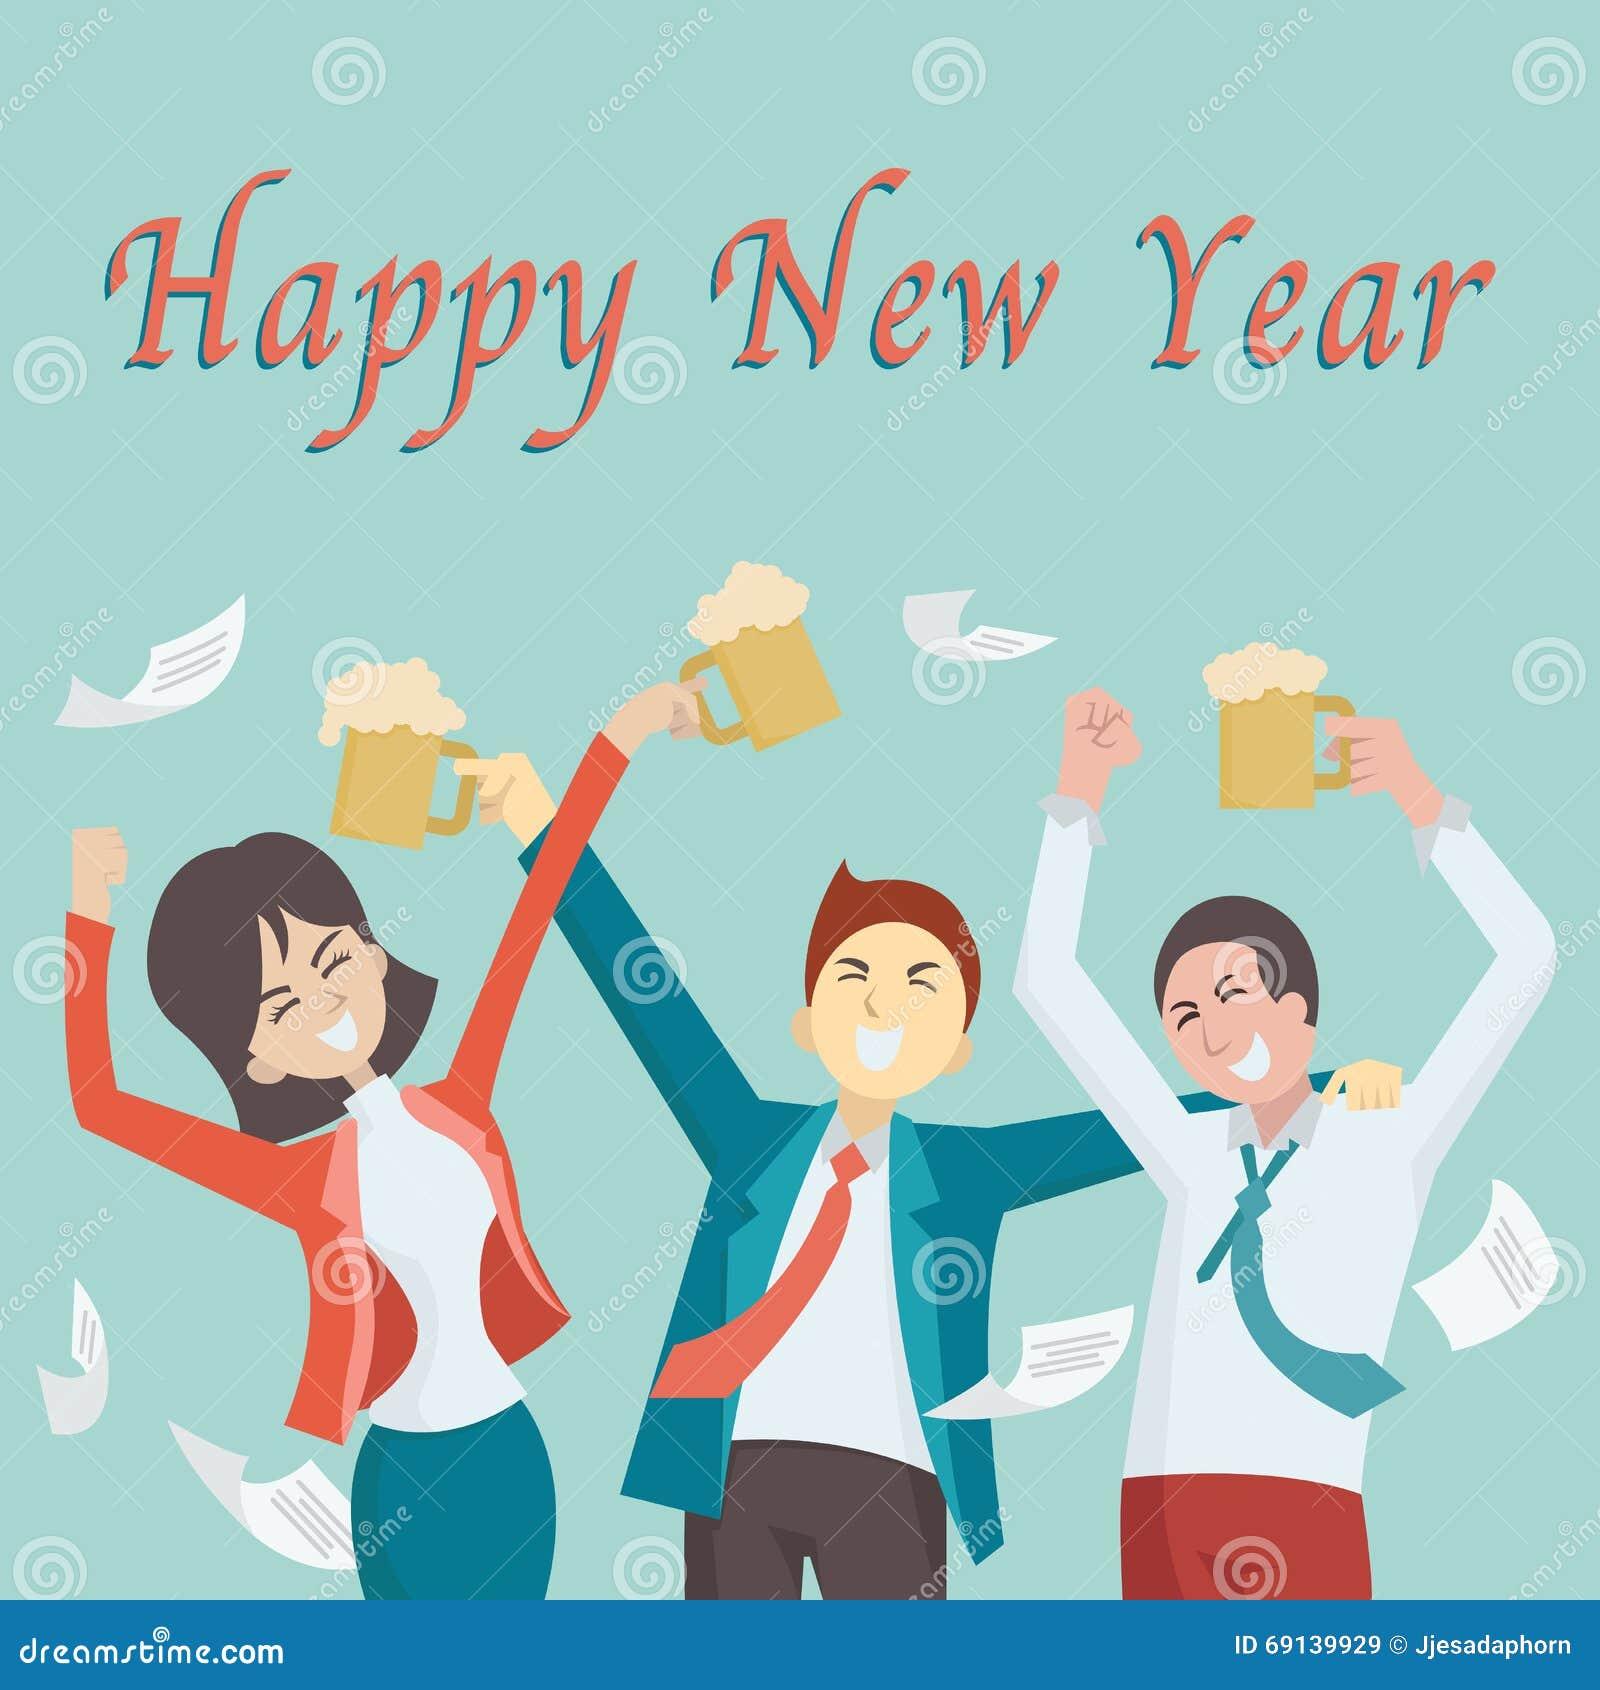 Happy New Year Office Stock Vector. Illustration Of Enjoy